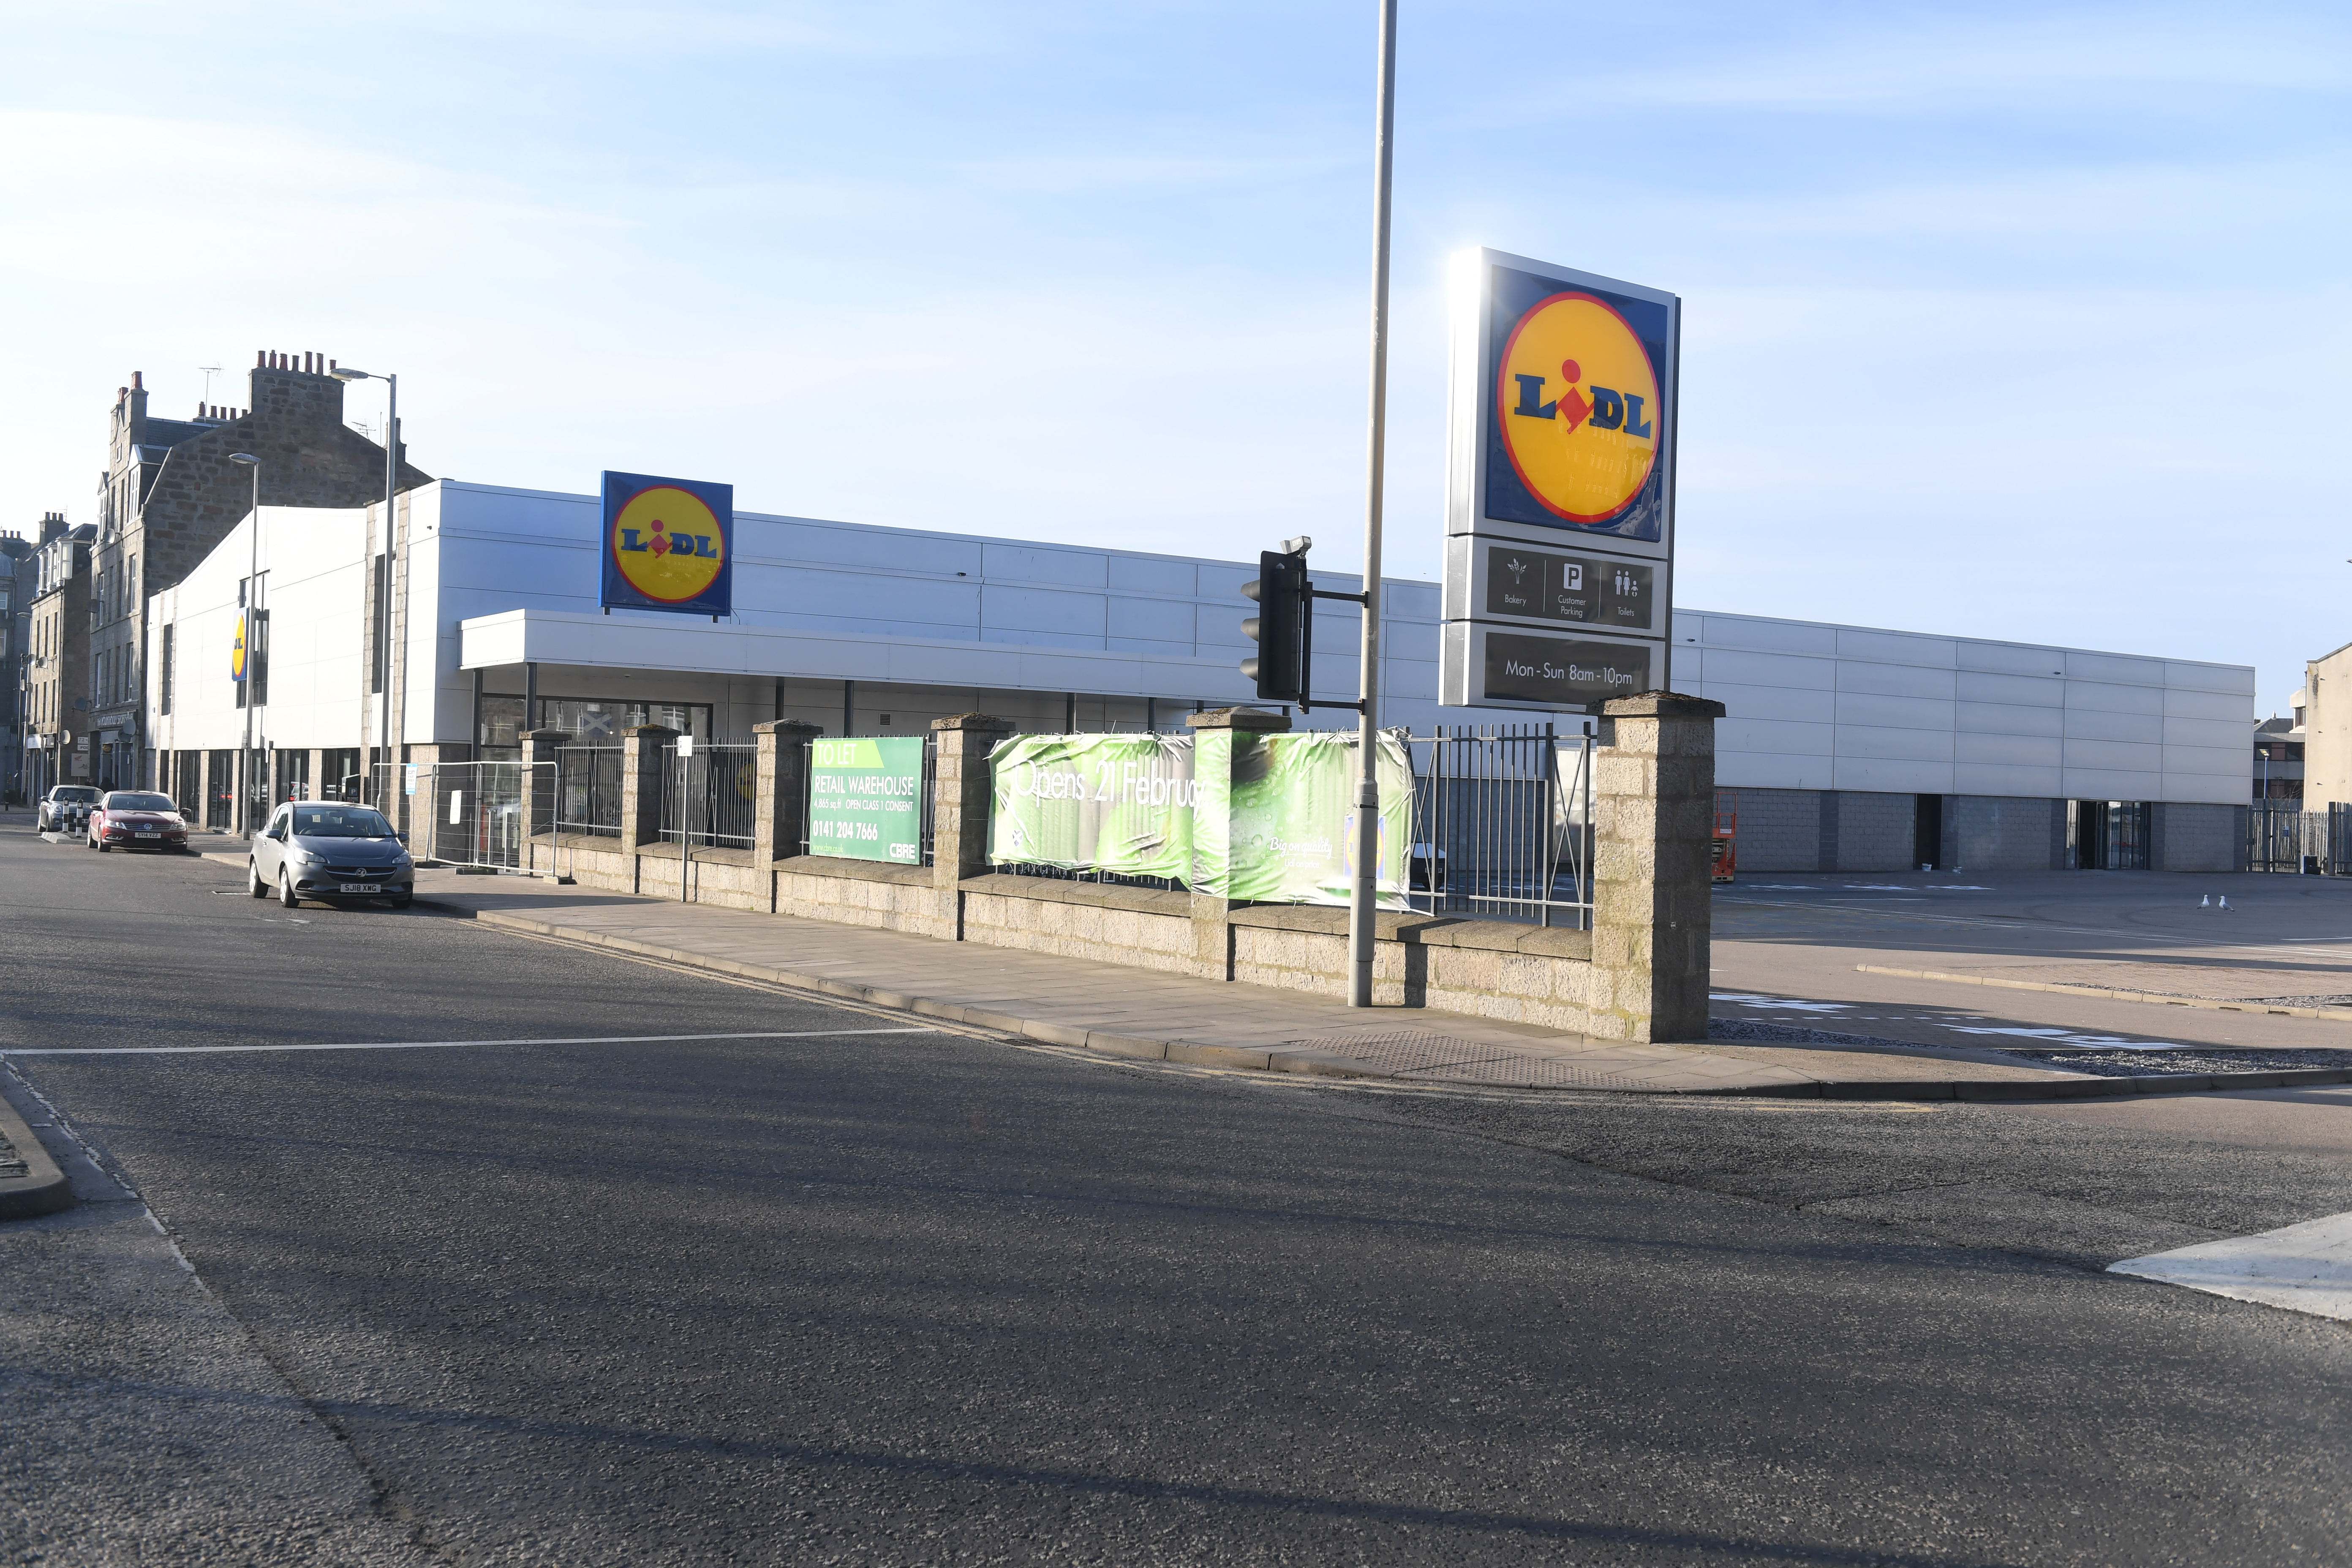 The new Lidl on Hutcheon Street will open its doors tomorrow